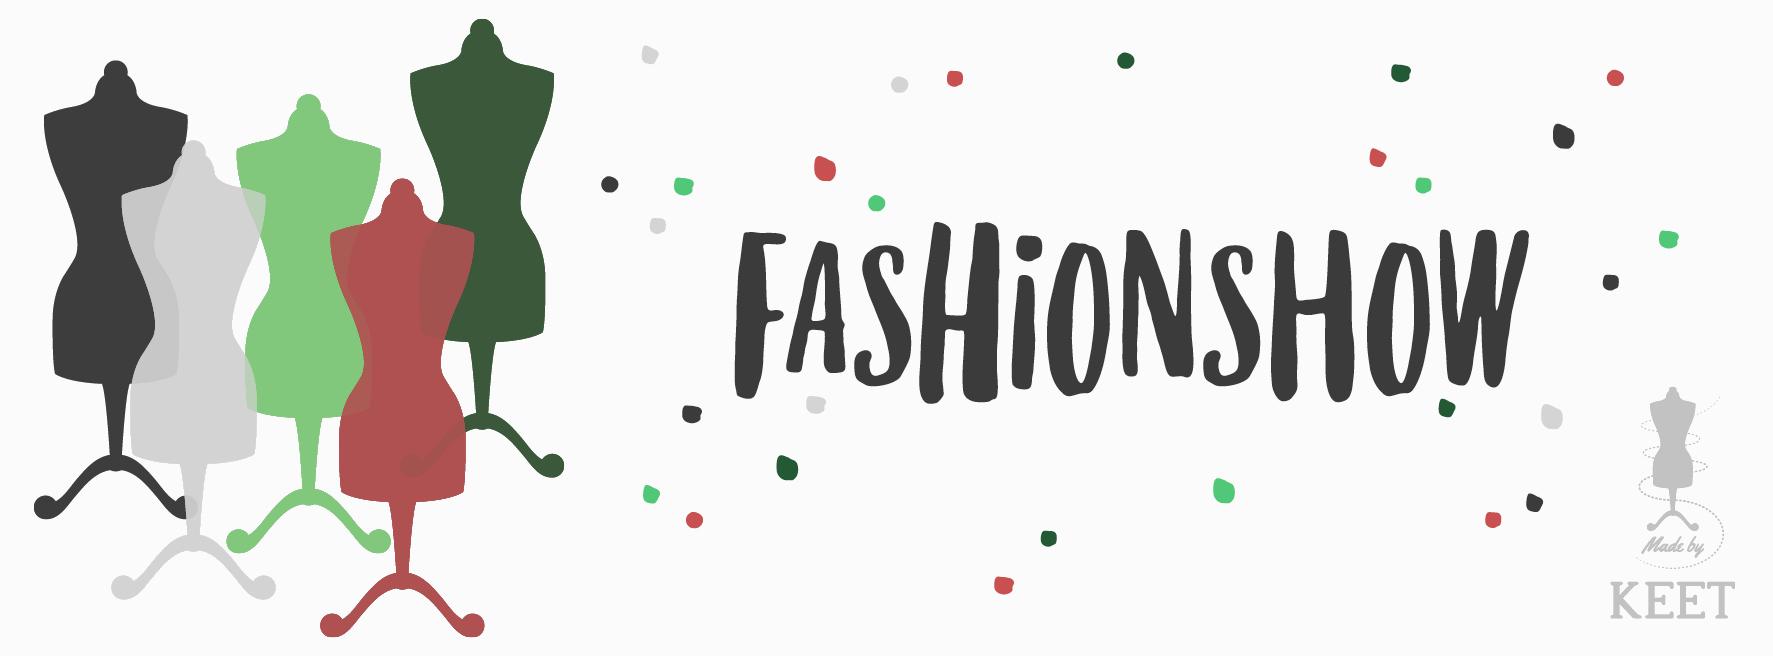 Fashionshow header